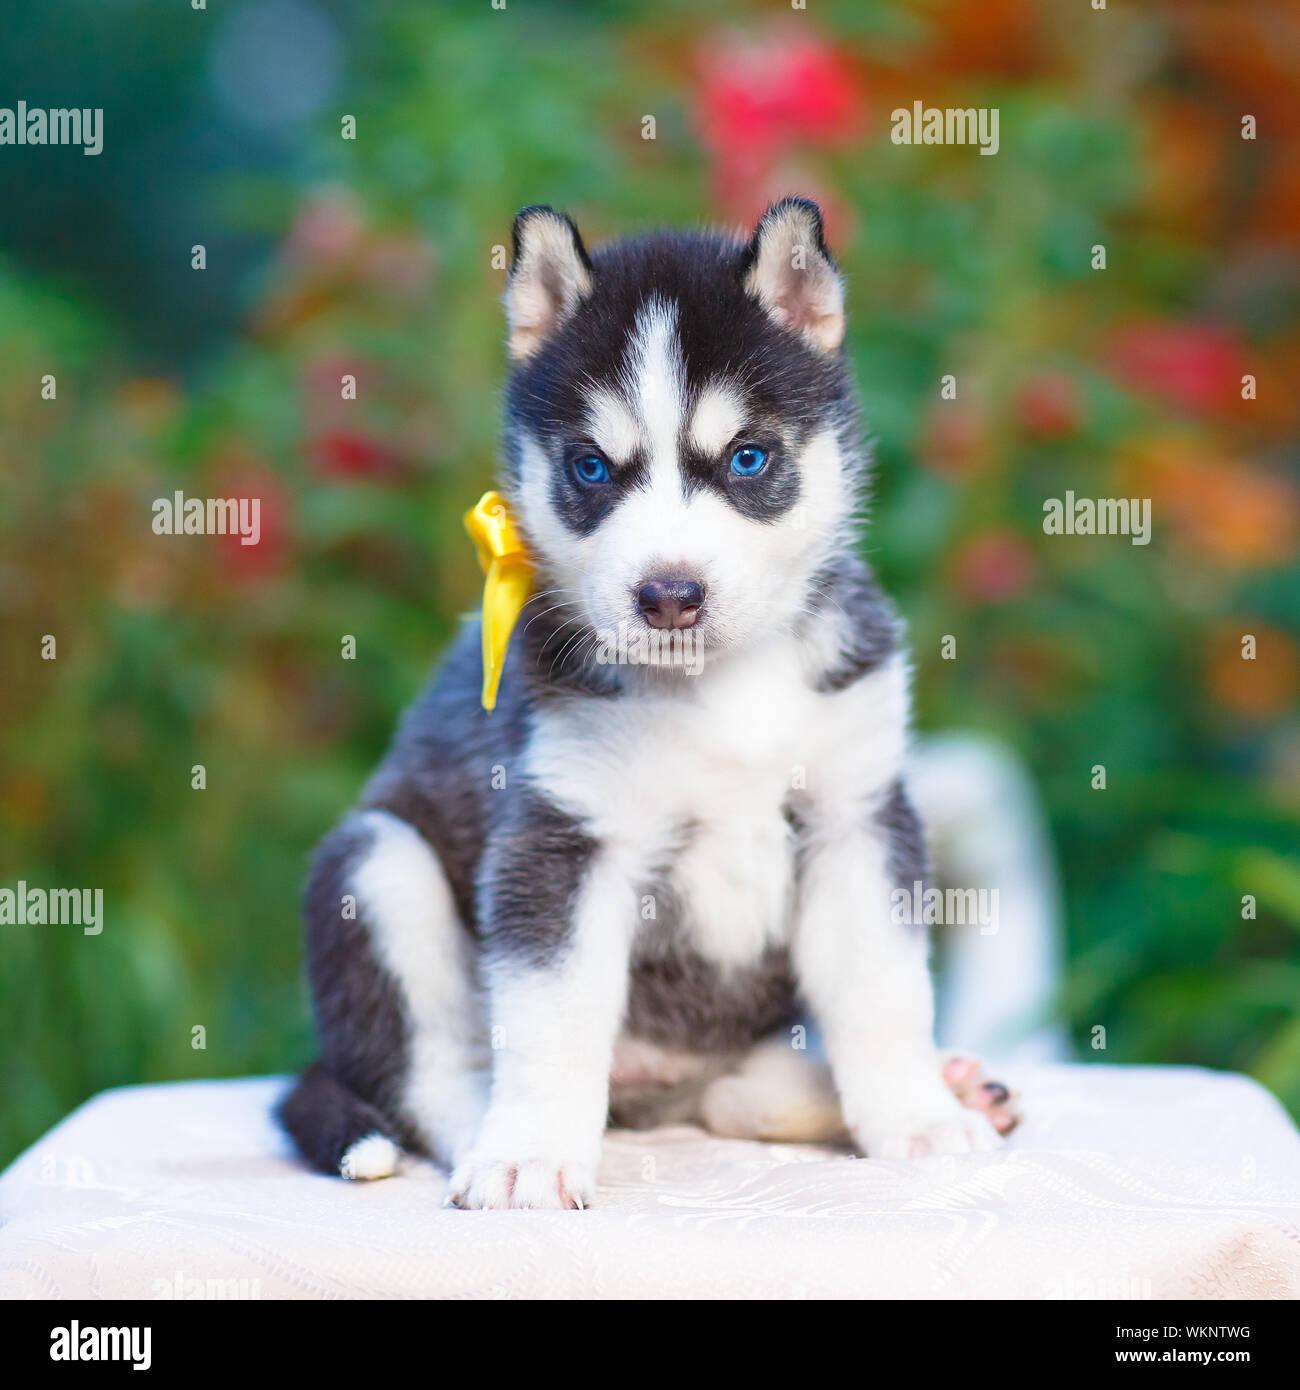 Siberian Husky Puppy With Blue Eyes Stock Photo Alamy